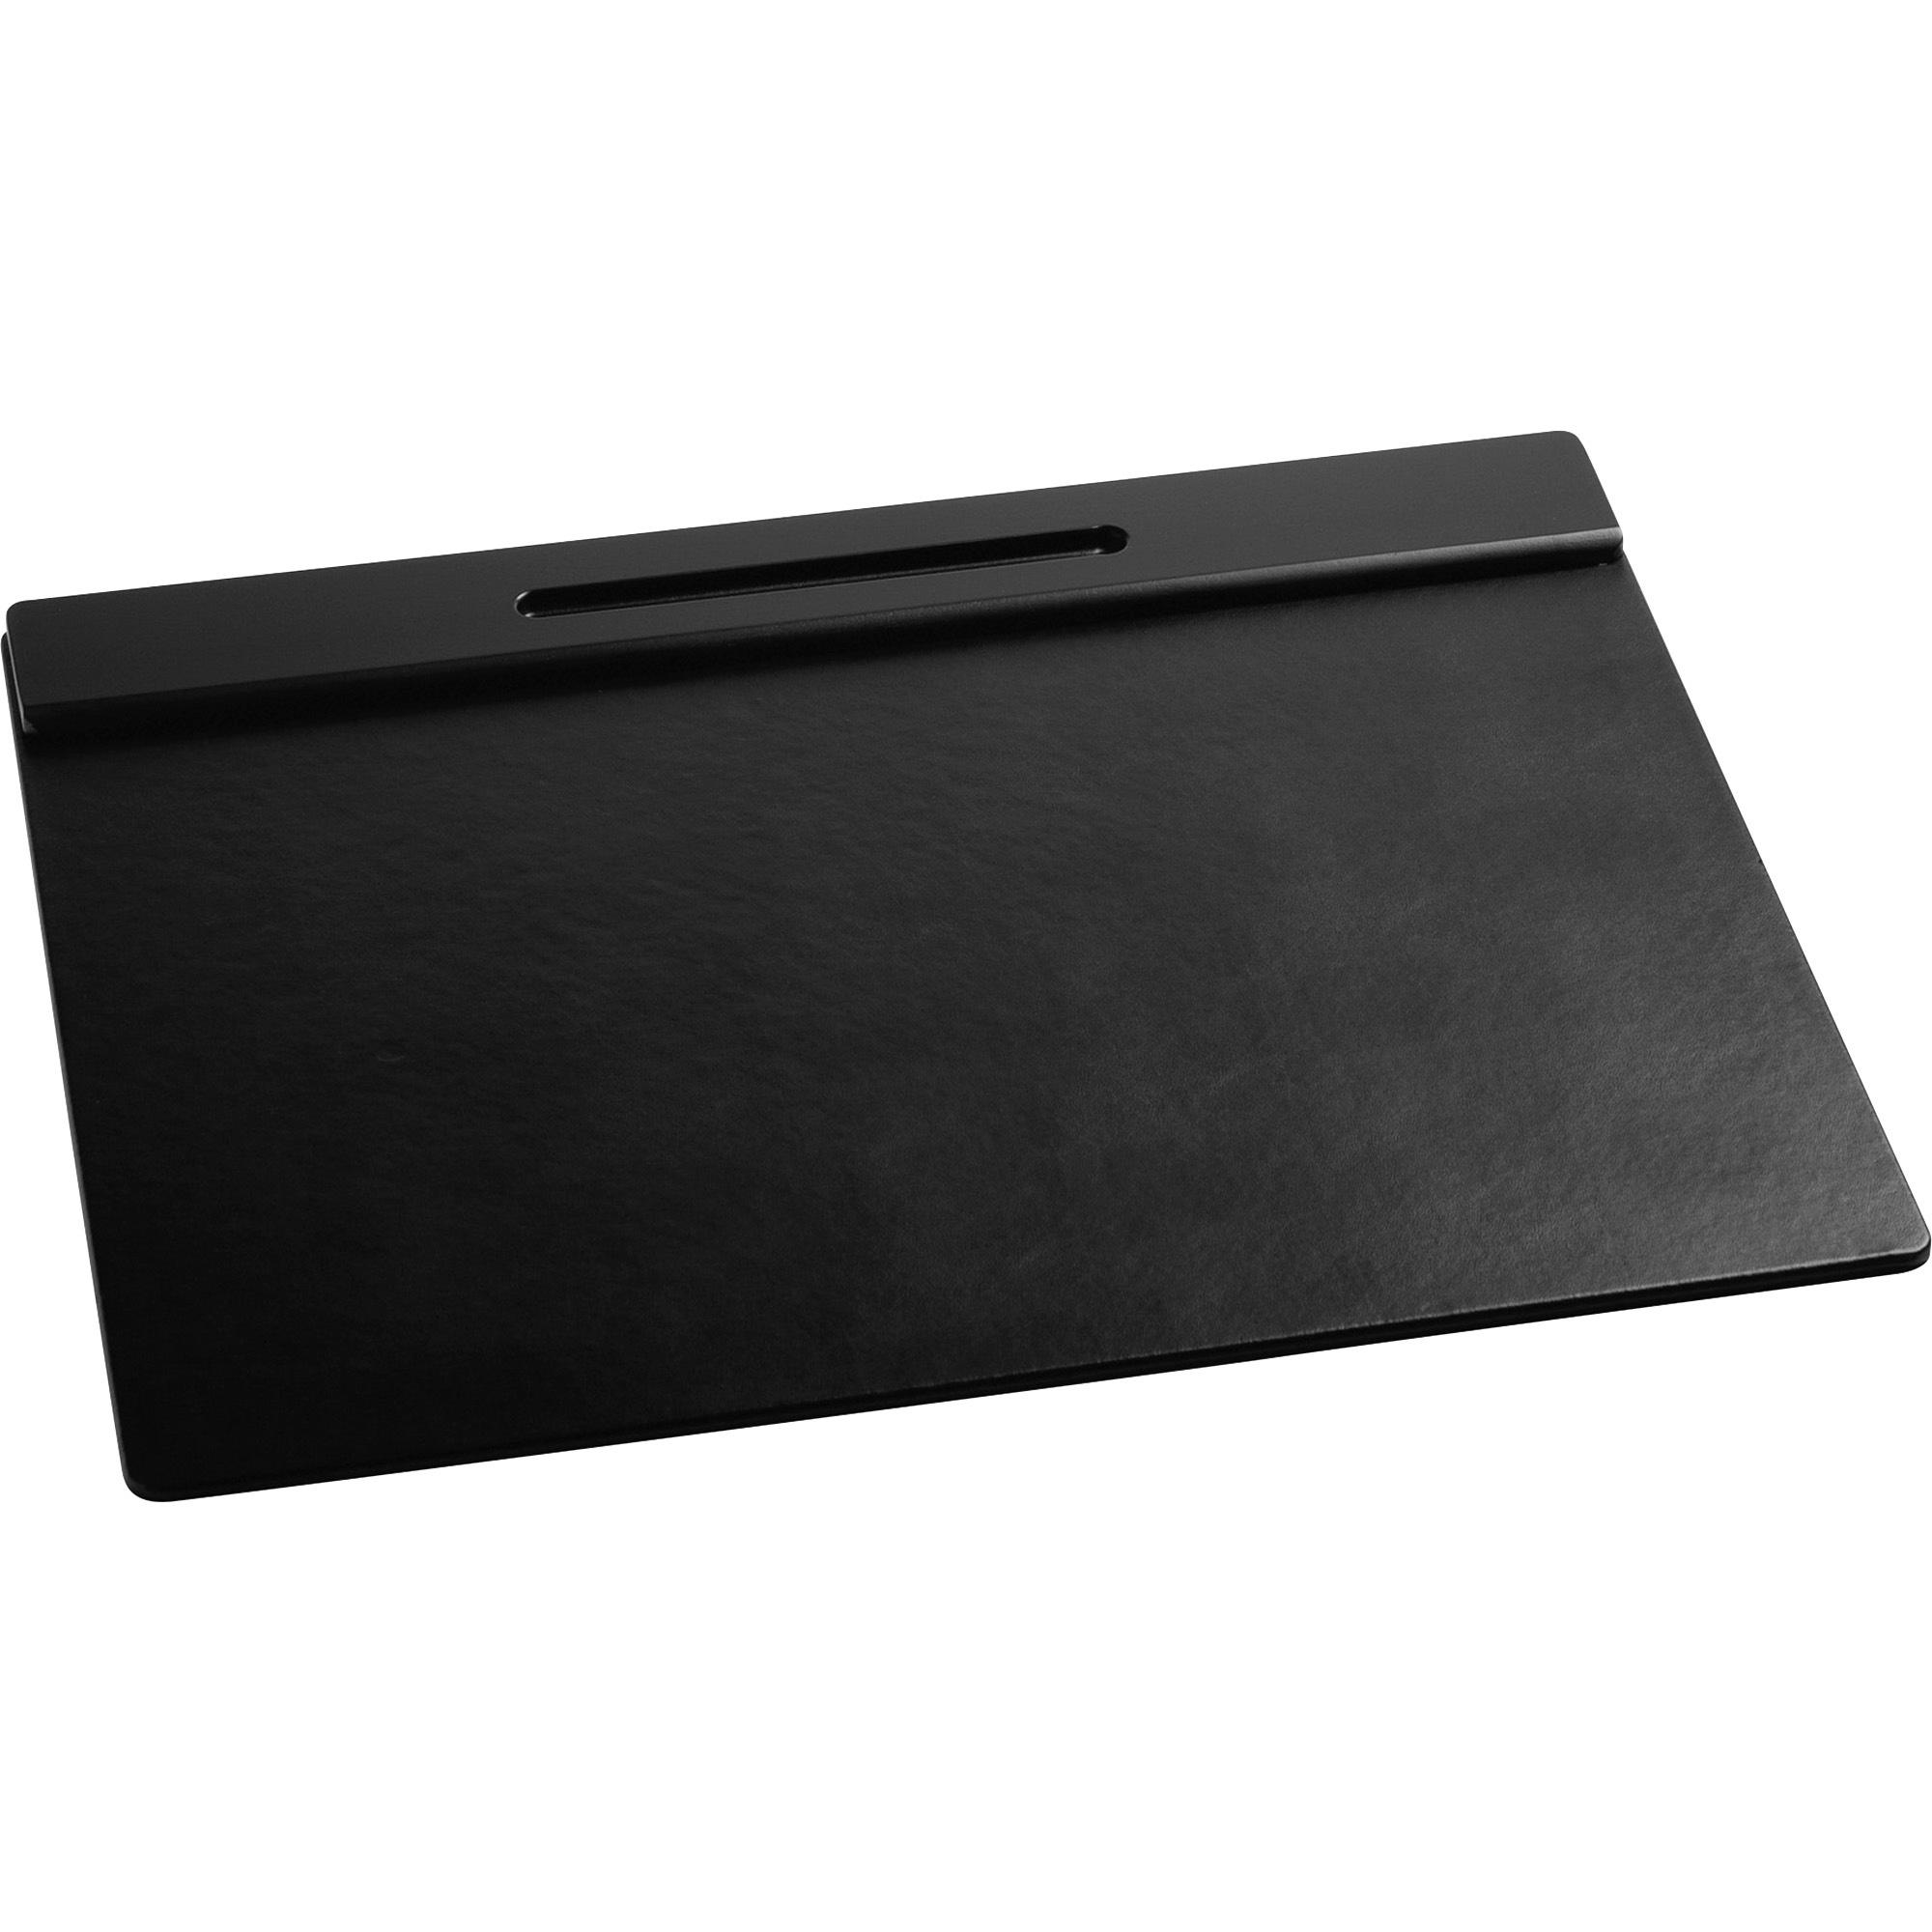 Rolodex Wood Tones Desk Pads Rectangle 24 609 60 Mm Width X 19 482 Depth Felt Black